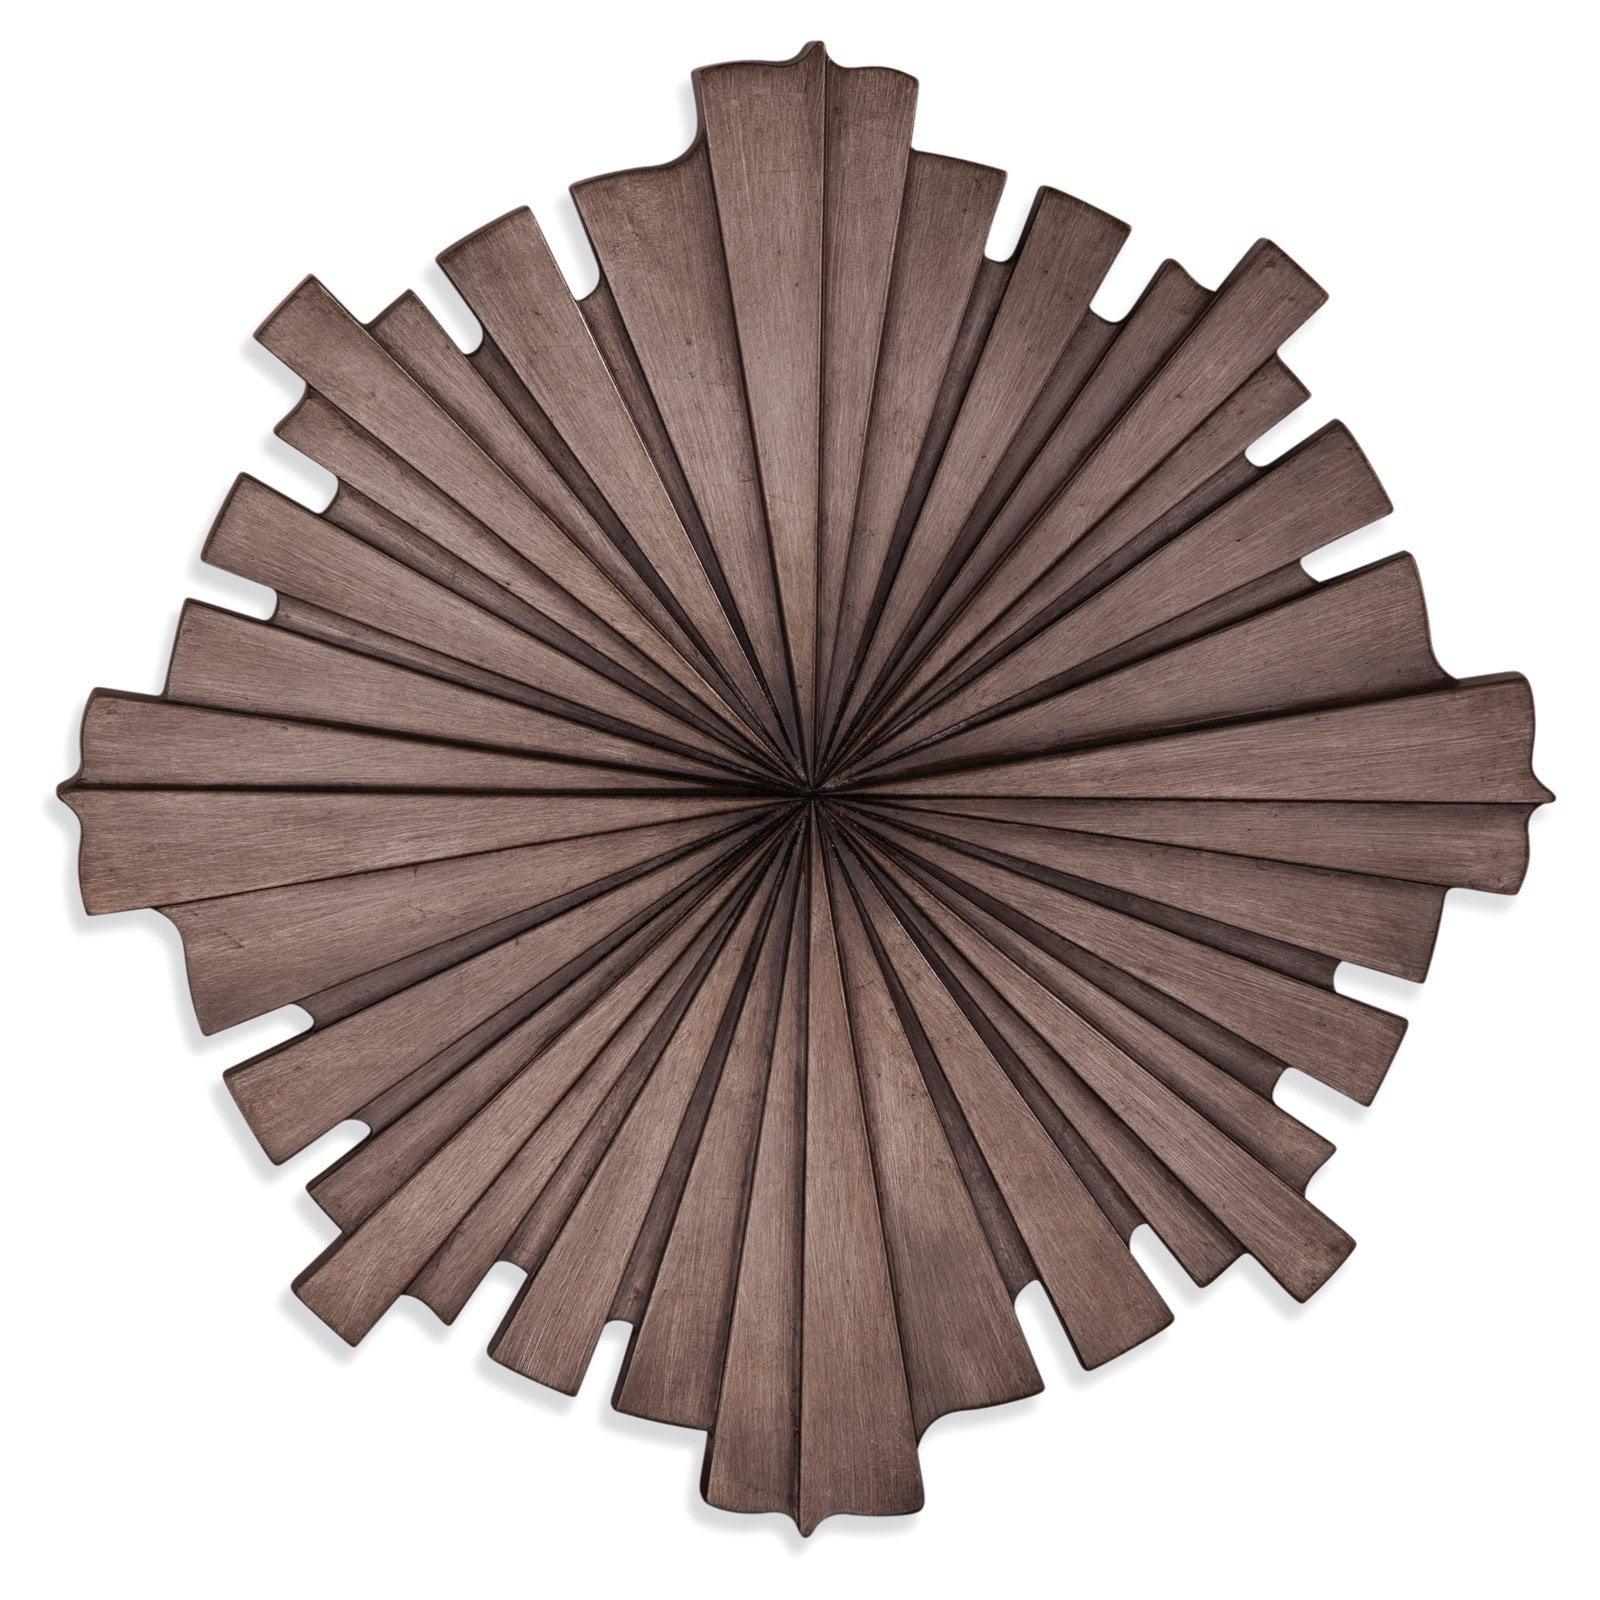 Bassett Mirror Company Brown Sunburst Wall Sculpture